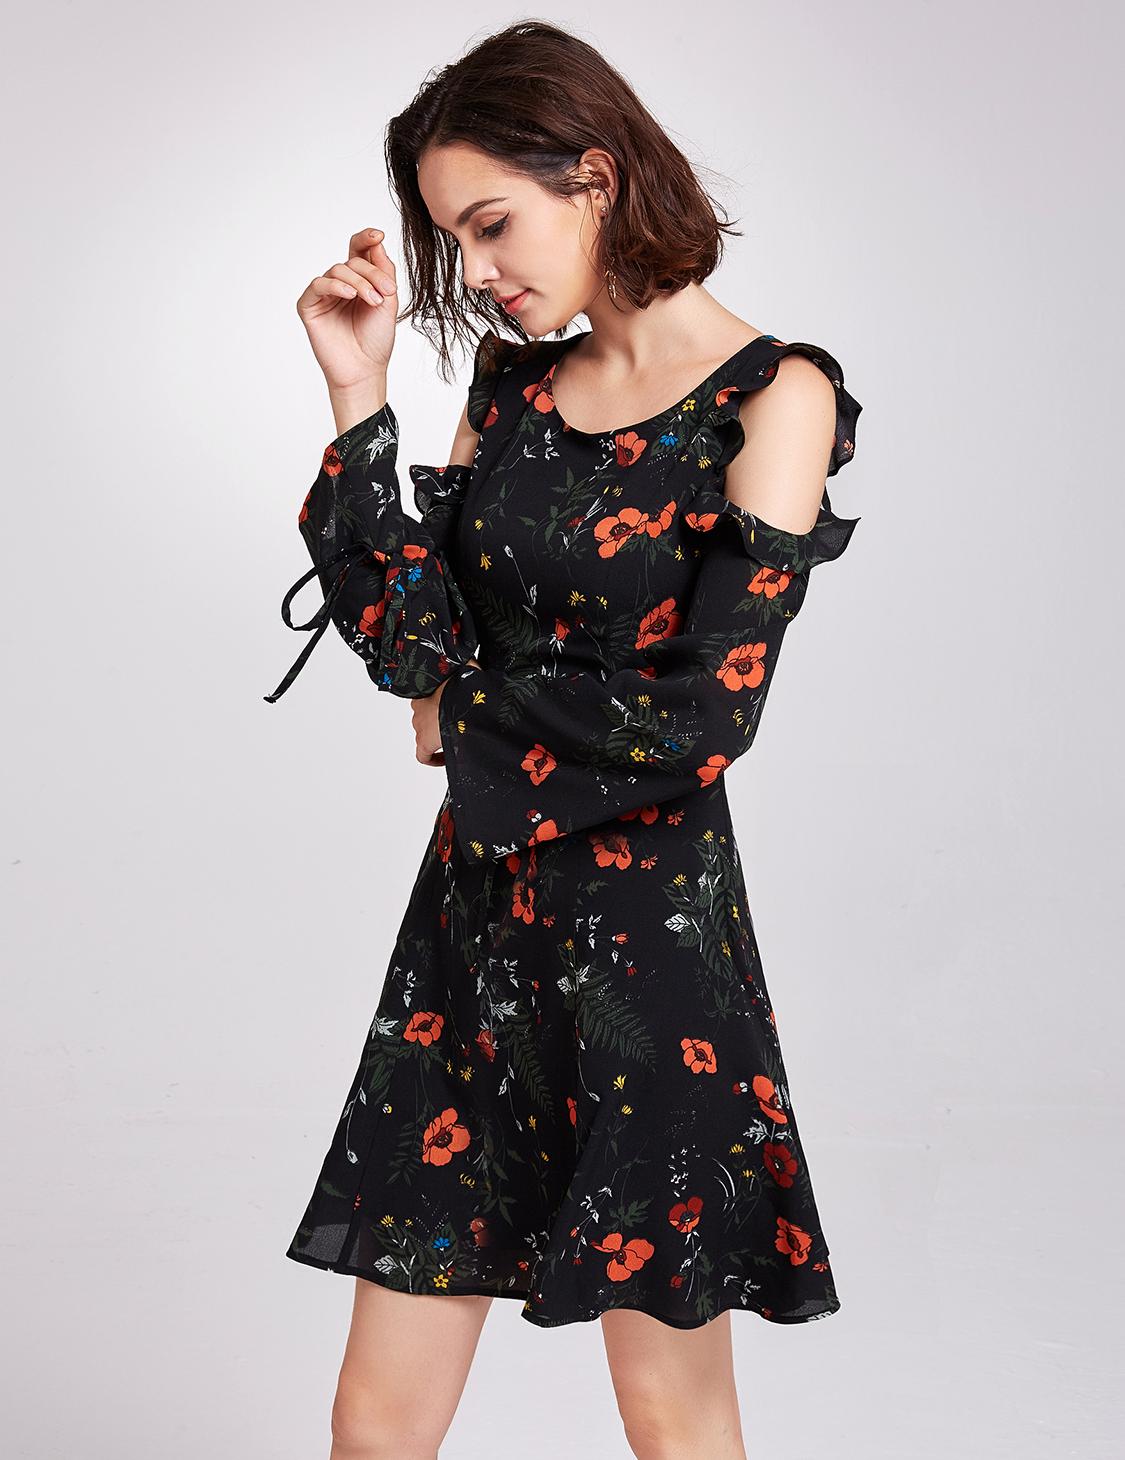 f7aa08519a97a Alisa Pan Summer Dresses Maxi Retro Floral Long Sleeve Short Casual ...